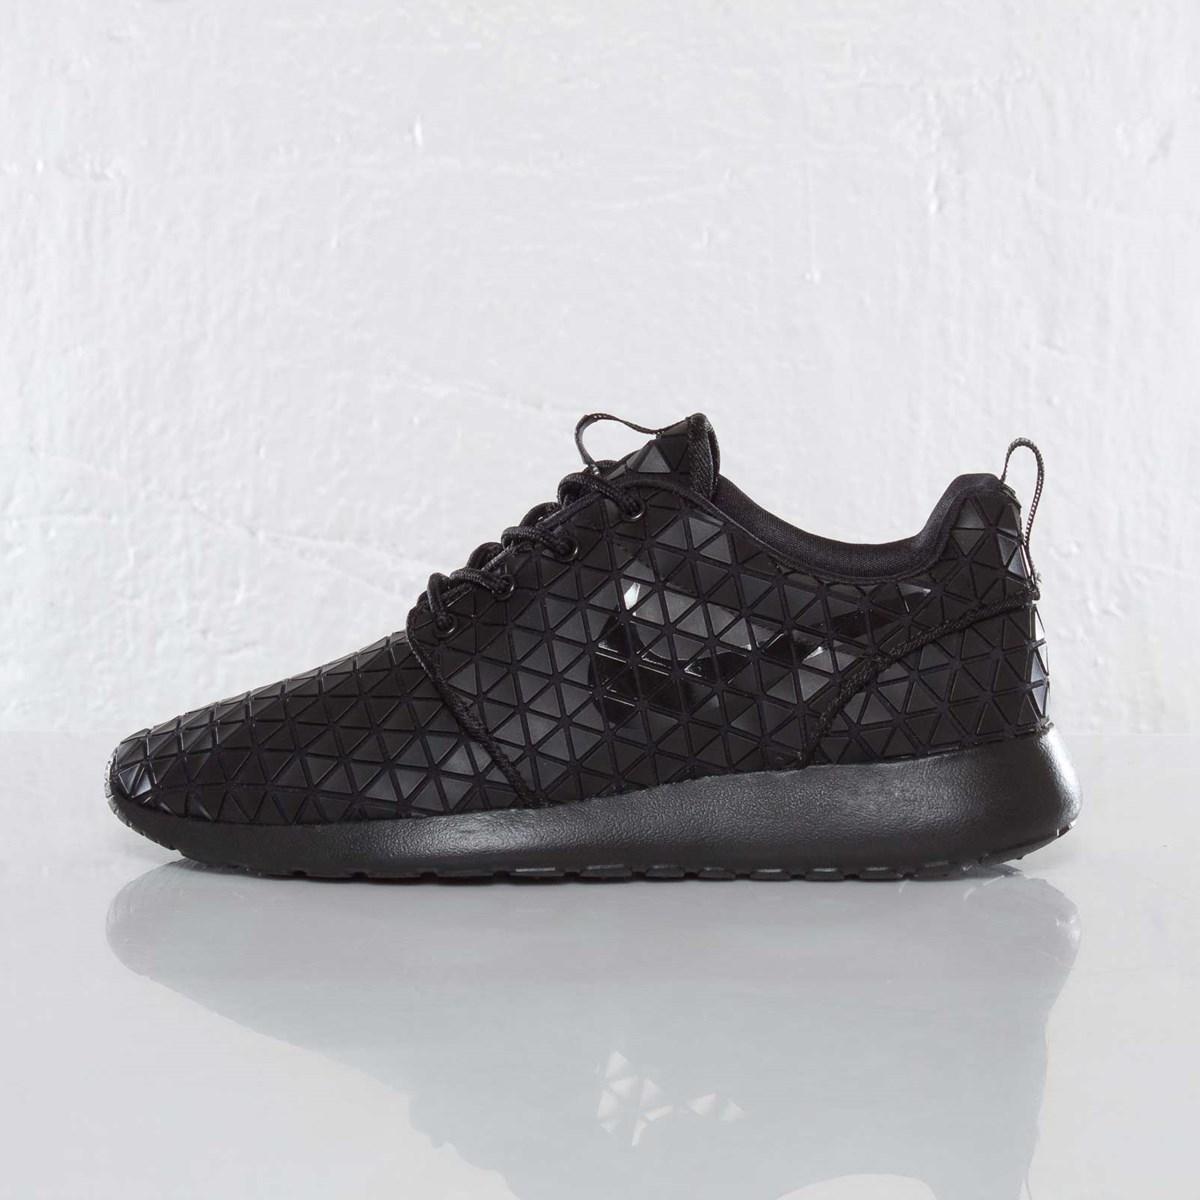 4f80c1b6b61c3 Nike Wmns Roshe Run Metric QS - 607284-001 - Sneakersnstuff I Sneakers    Streetwear online seit 1999